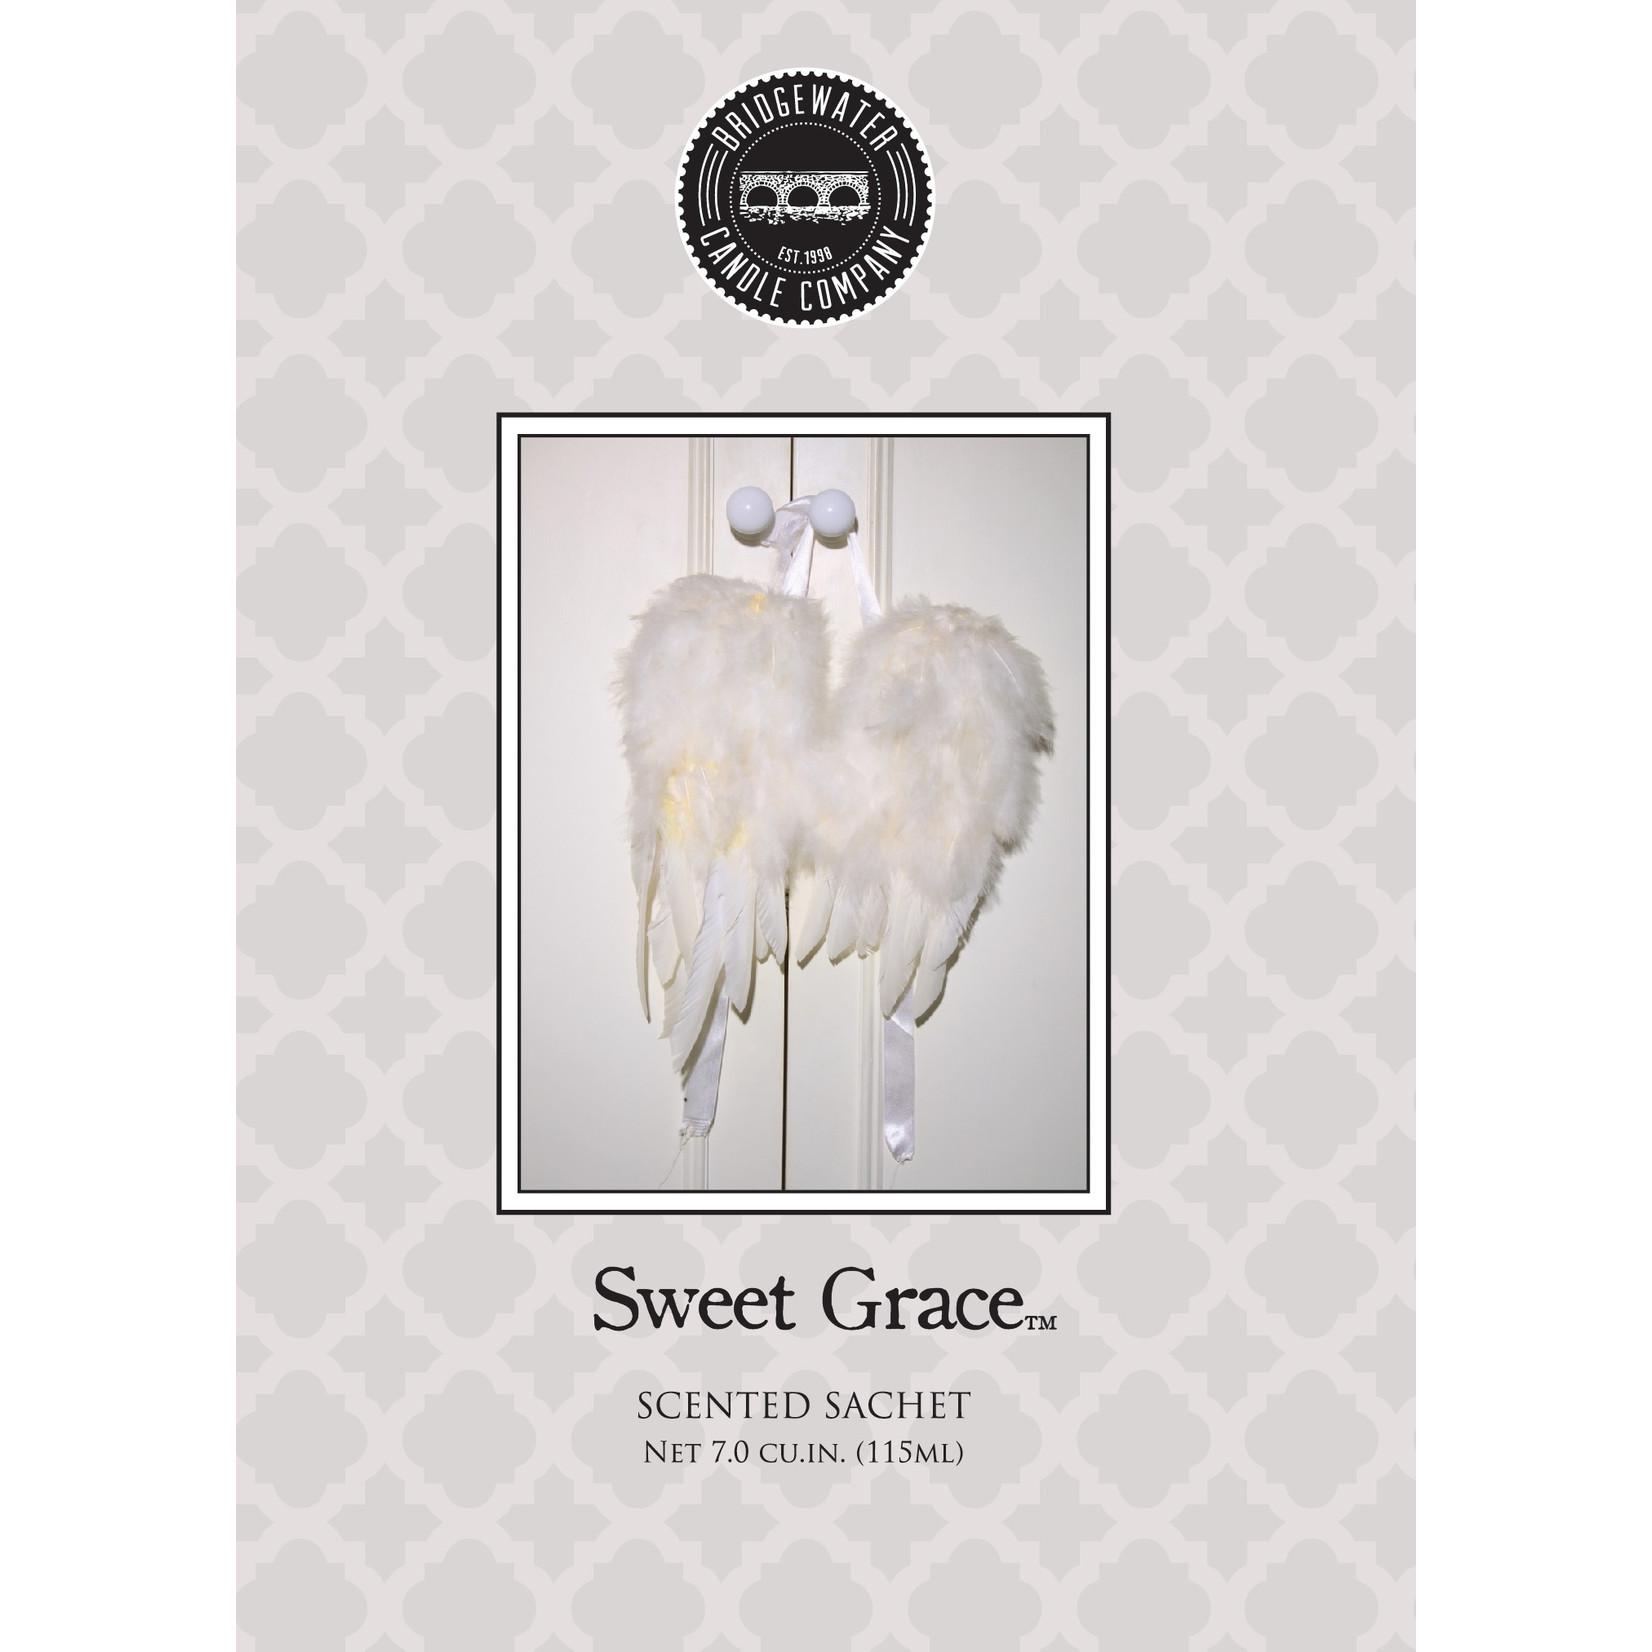 Bridgewater Scented Sachet / Geurzakje Sweet Grace